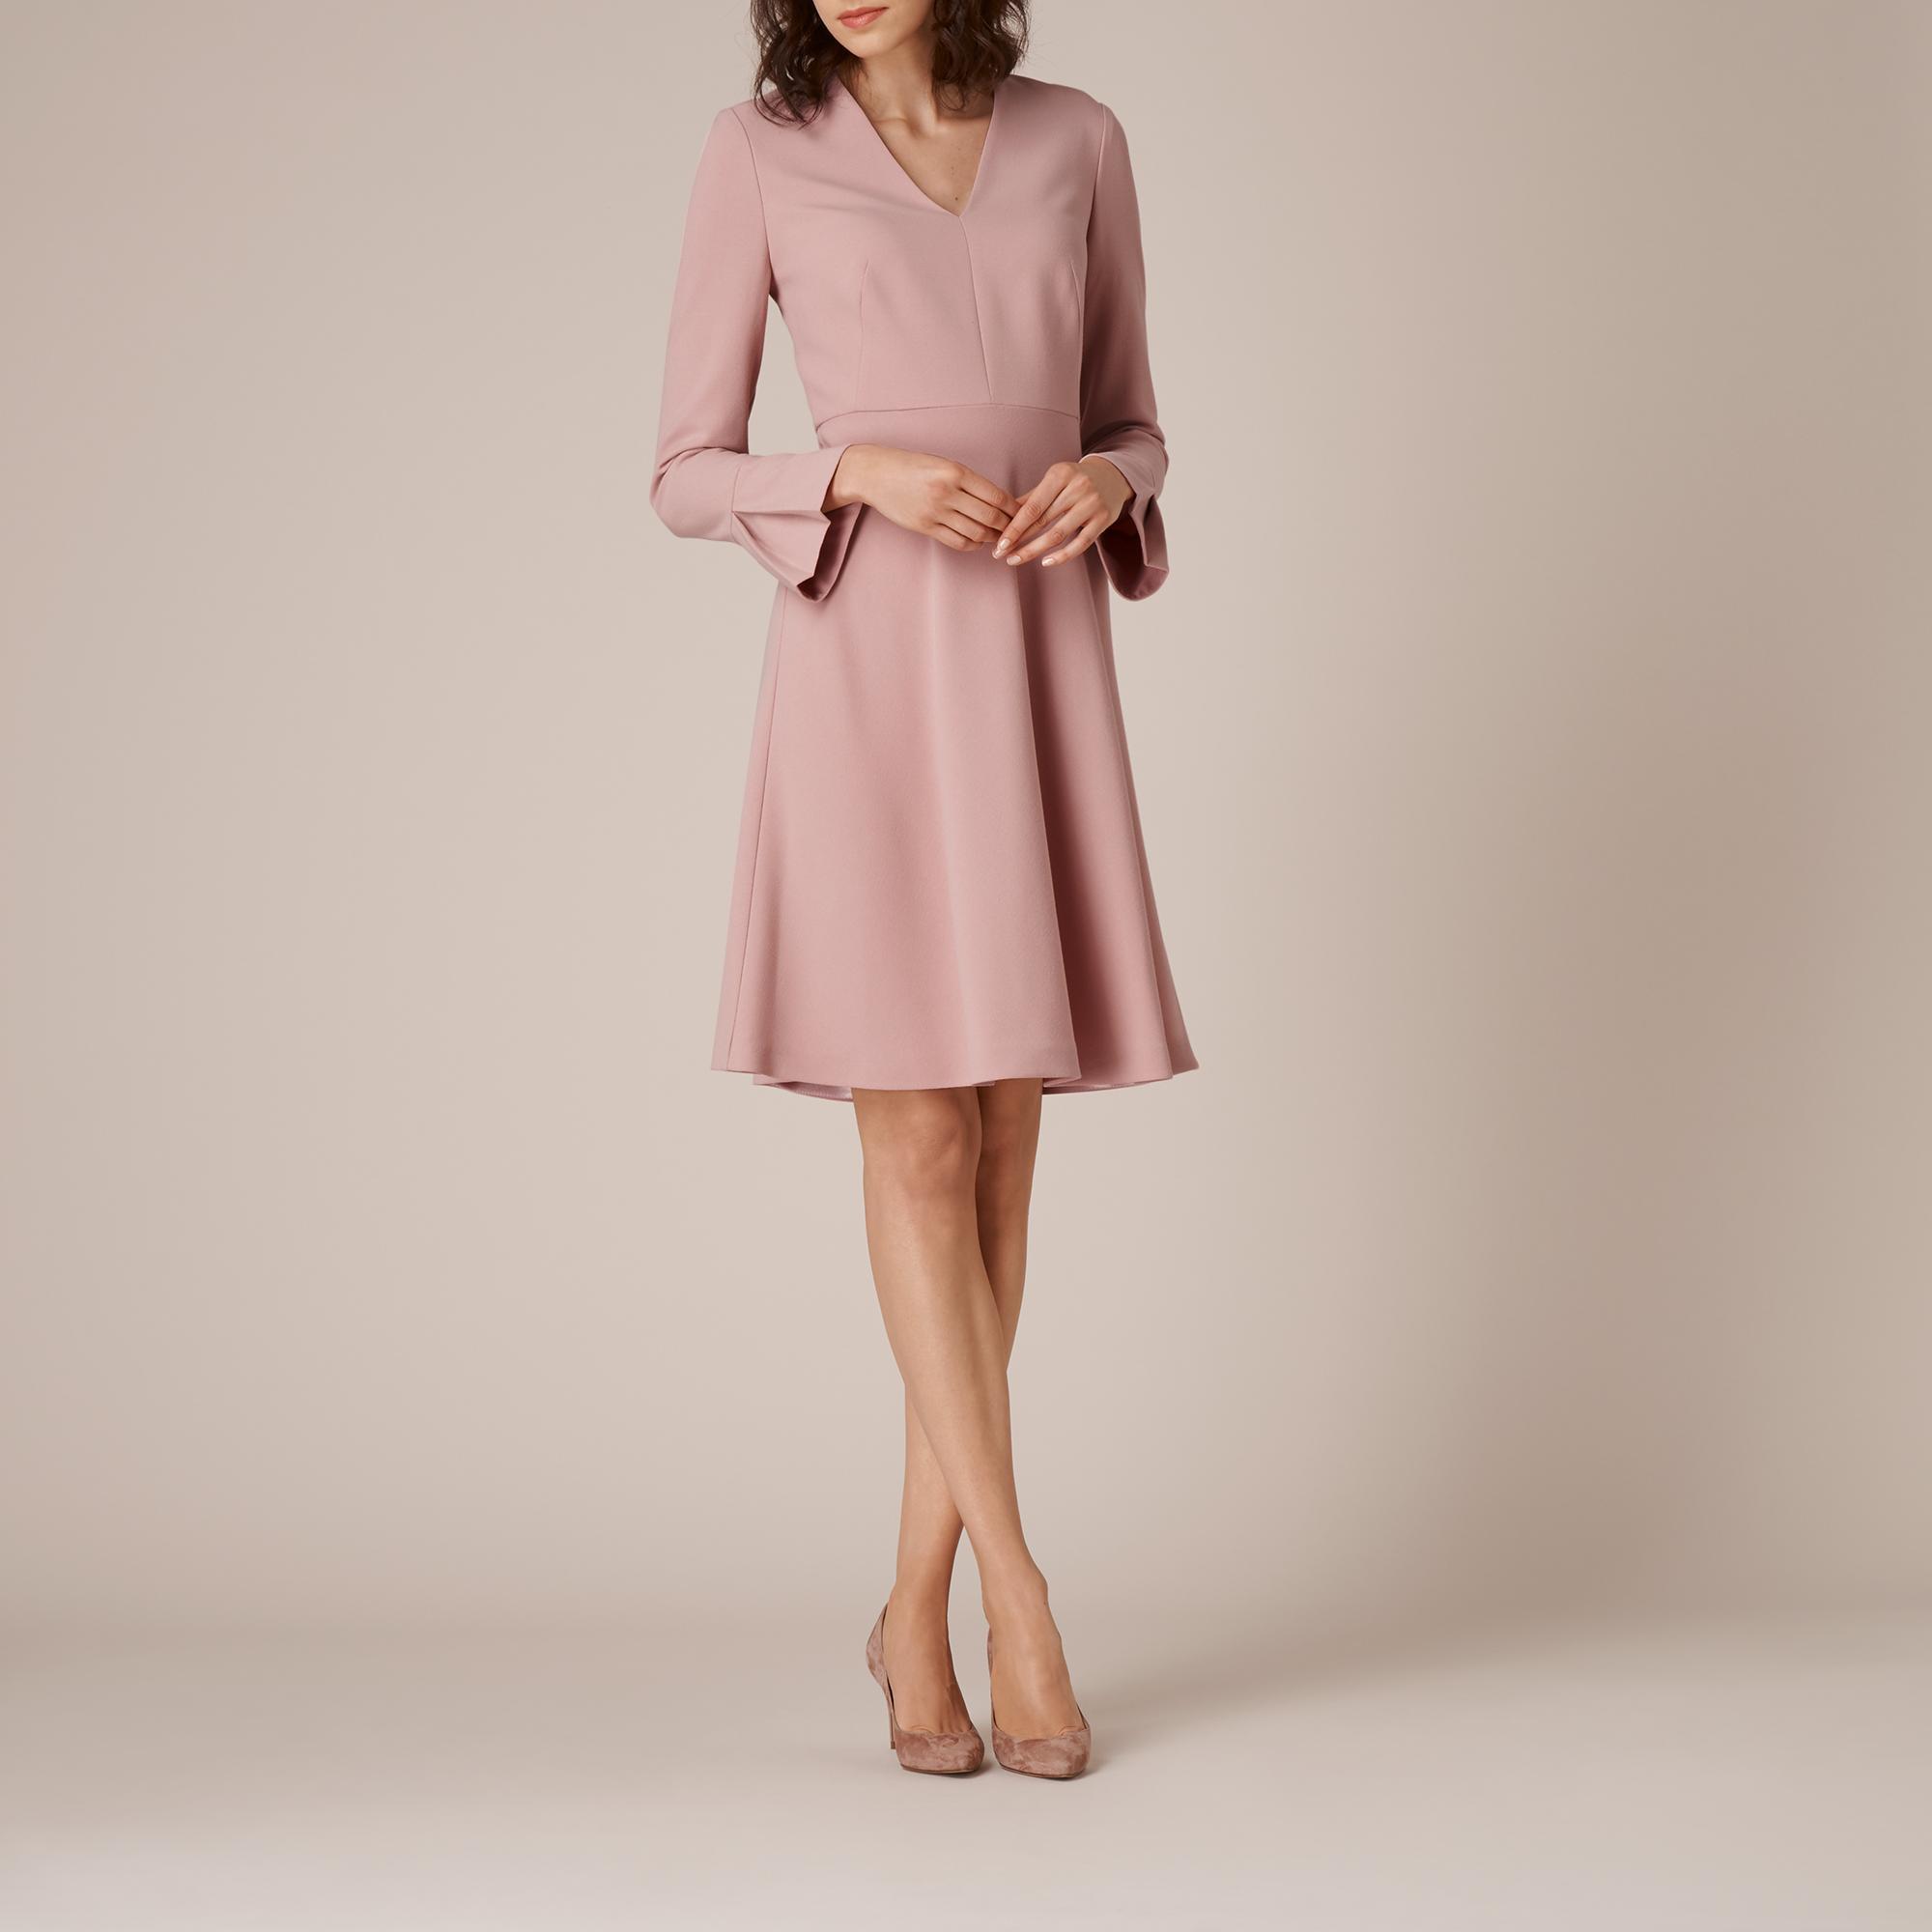 LK Bennett Amana rose dress